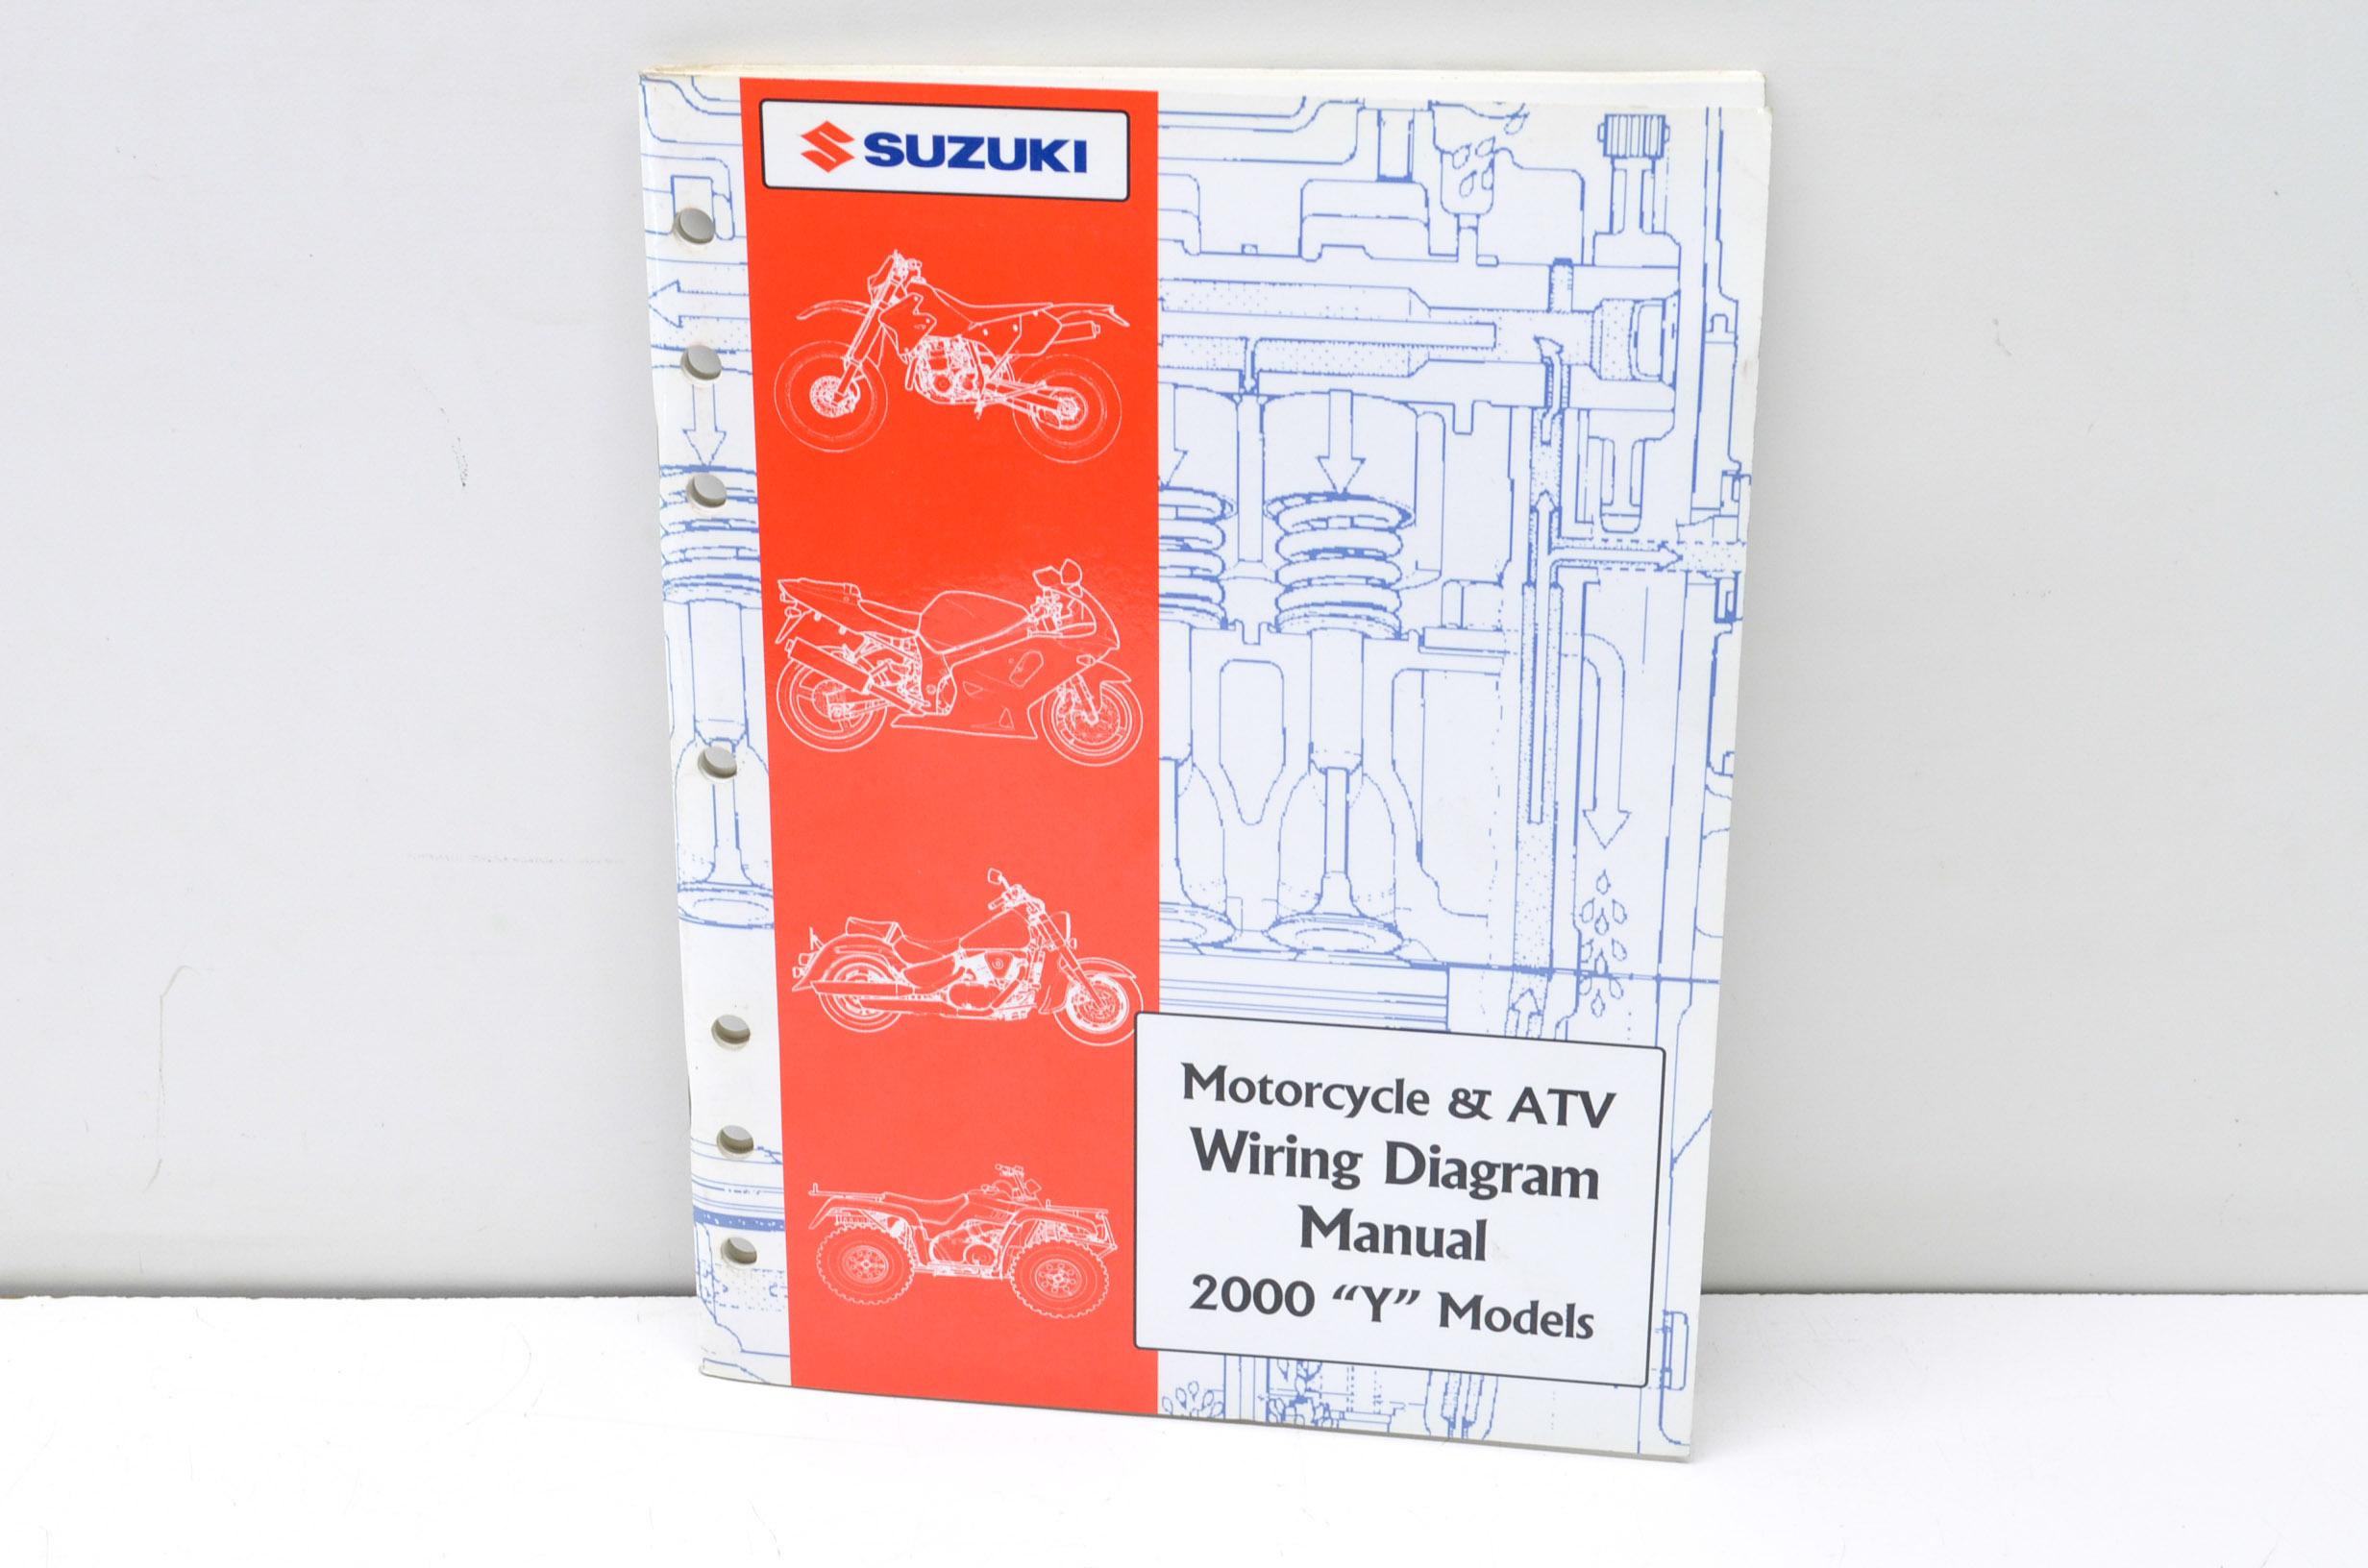 New Oem Suzuki Oem Suzuki Motorcycle  U0026 Atv Wiring Diagram